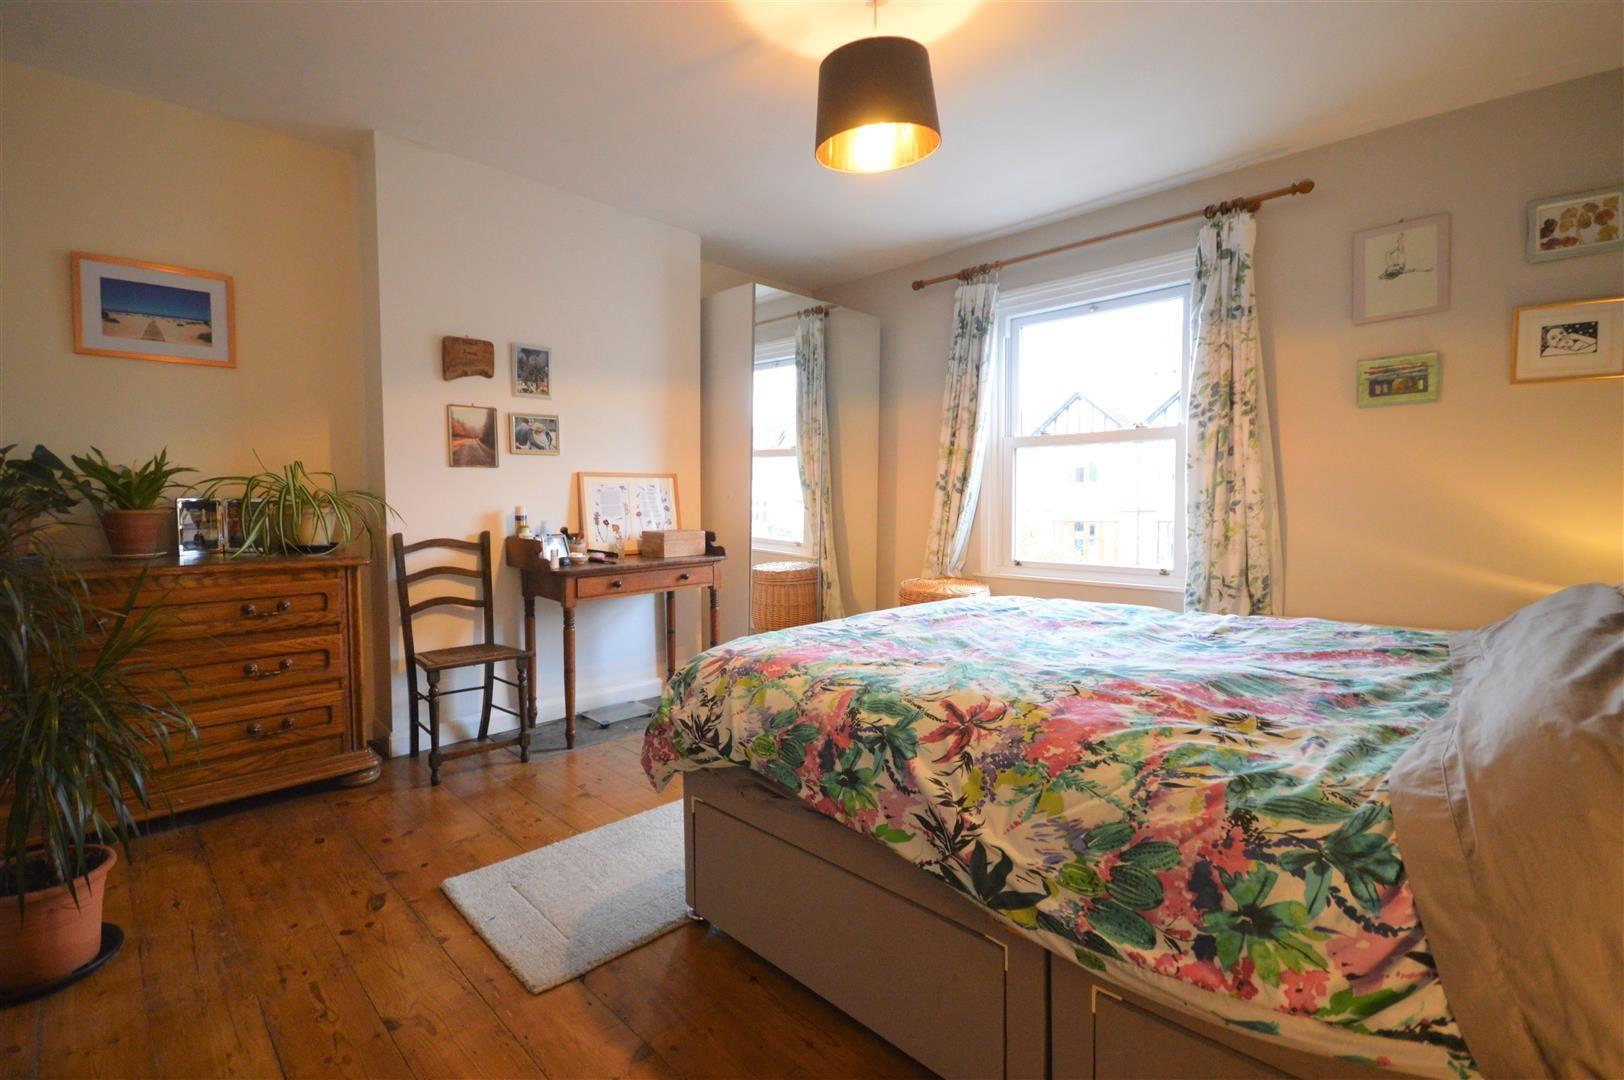 3 bed detached for sale in Leominster 8